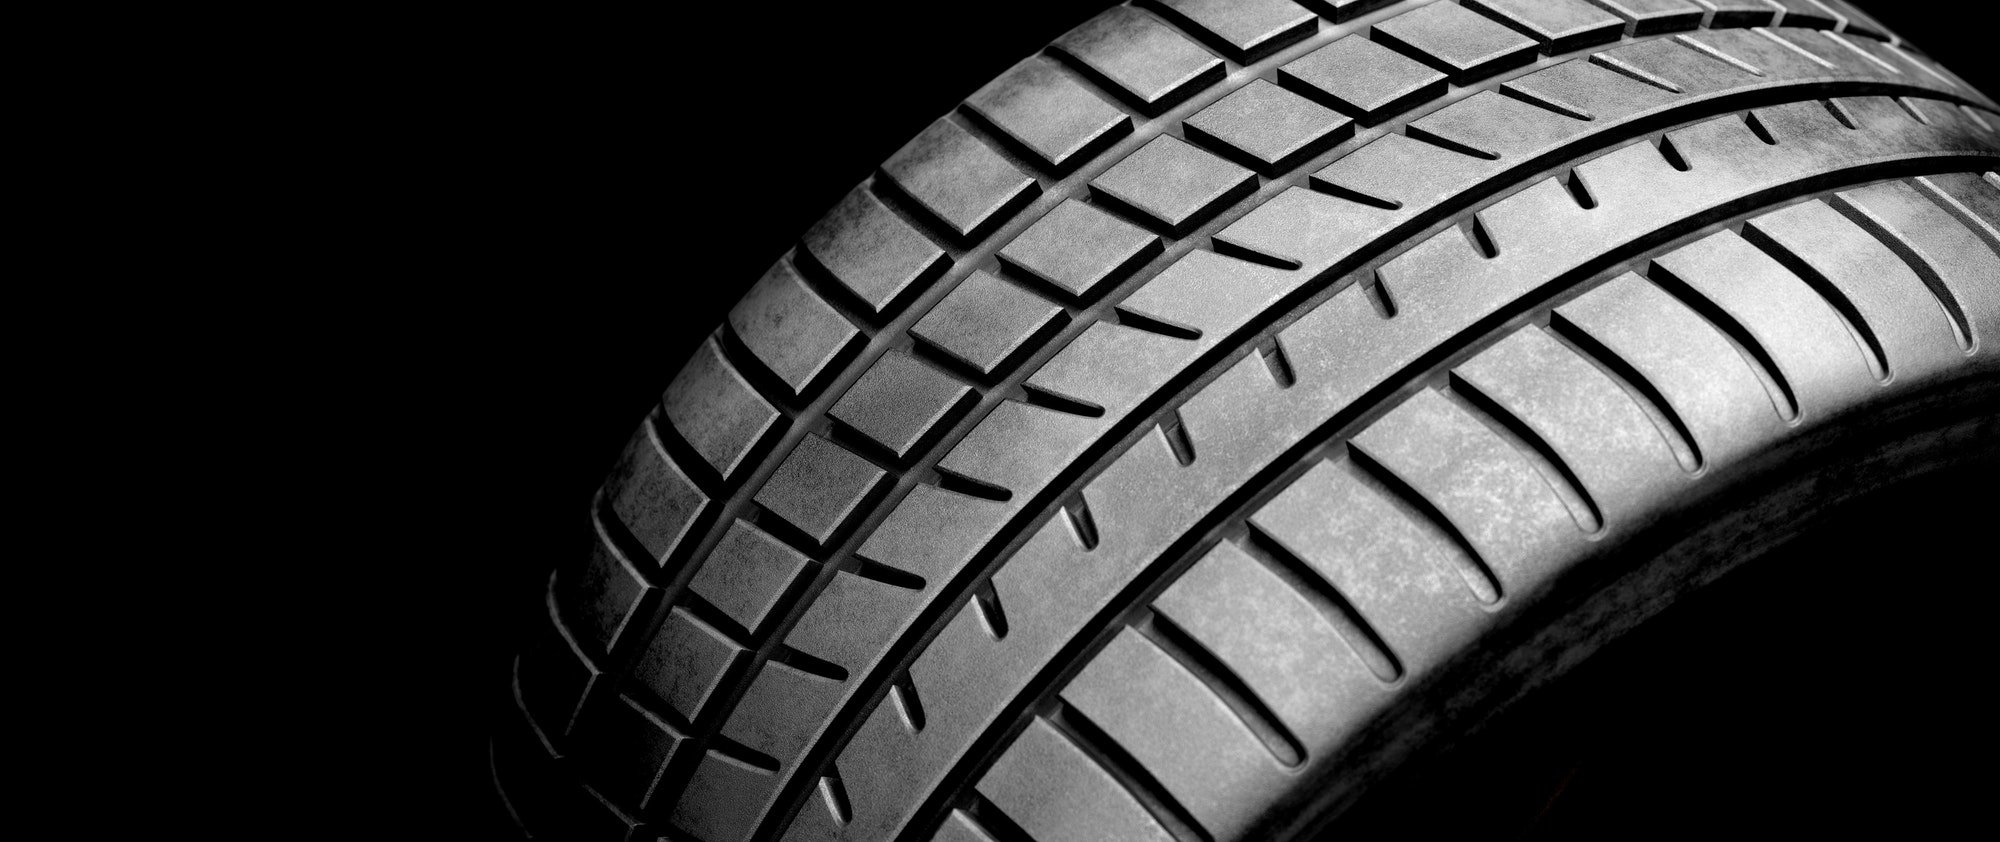 New wheel tire close-up on black